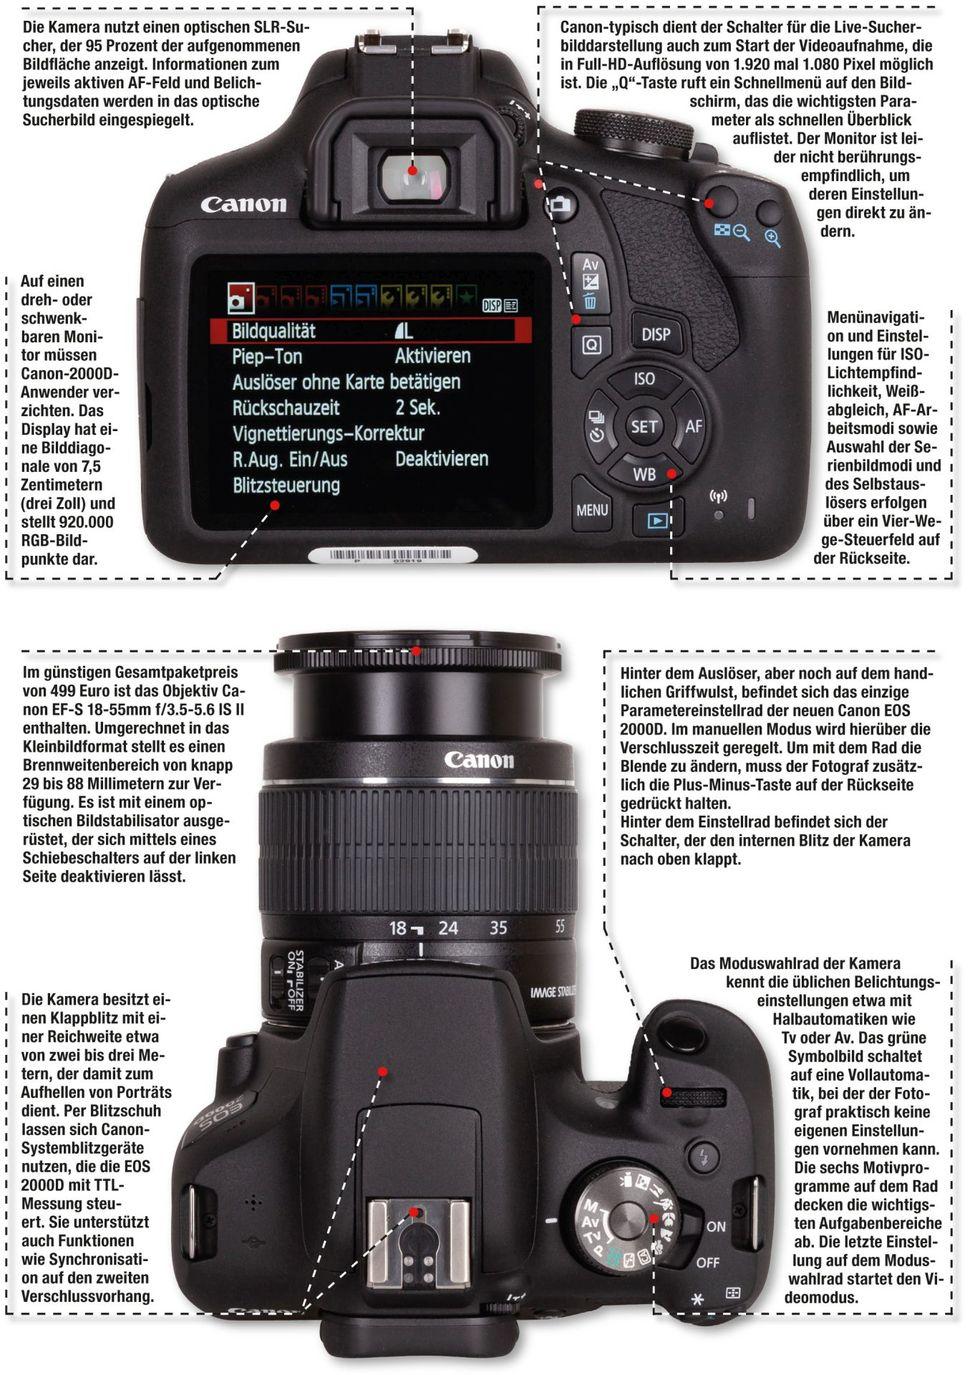 Kameratest Canon EOS 2000D | FOTO HITS Magazin